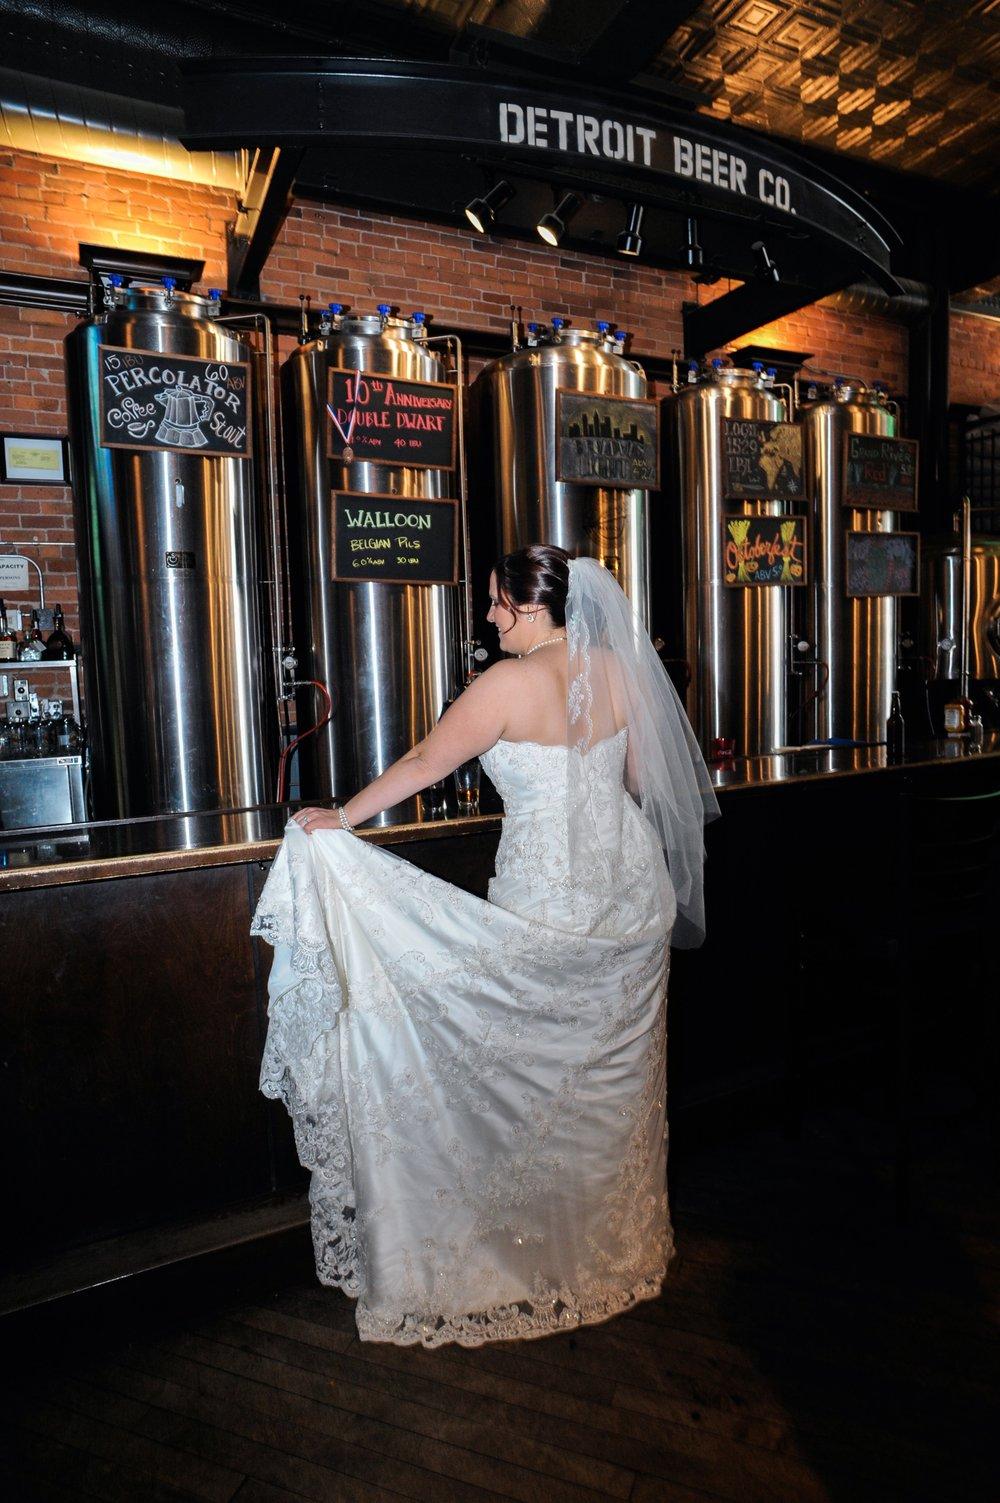 detroit beer company.jpg